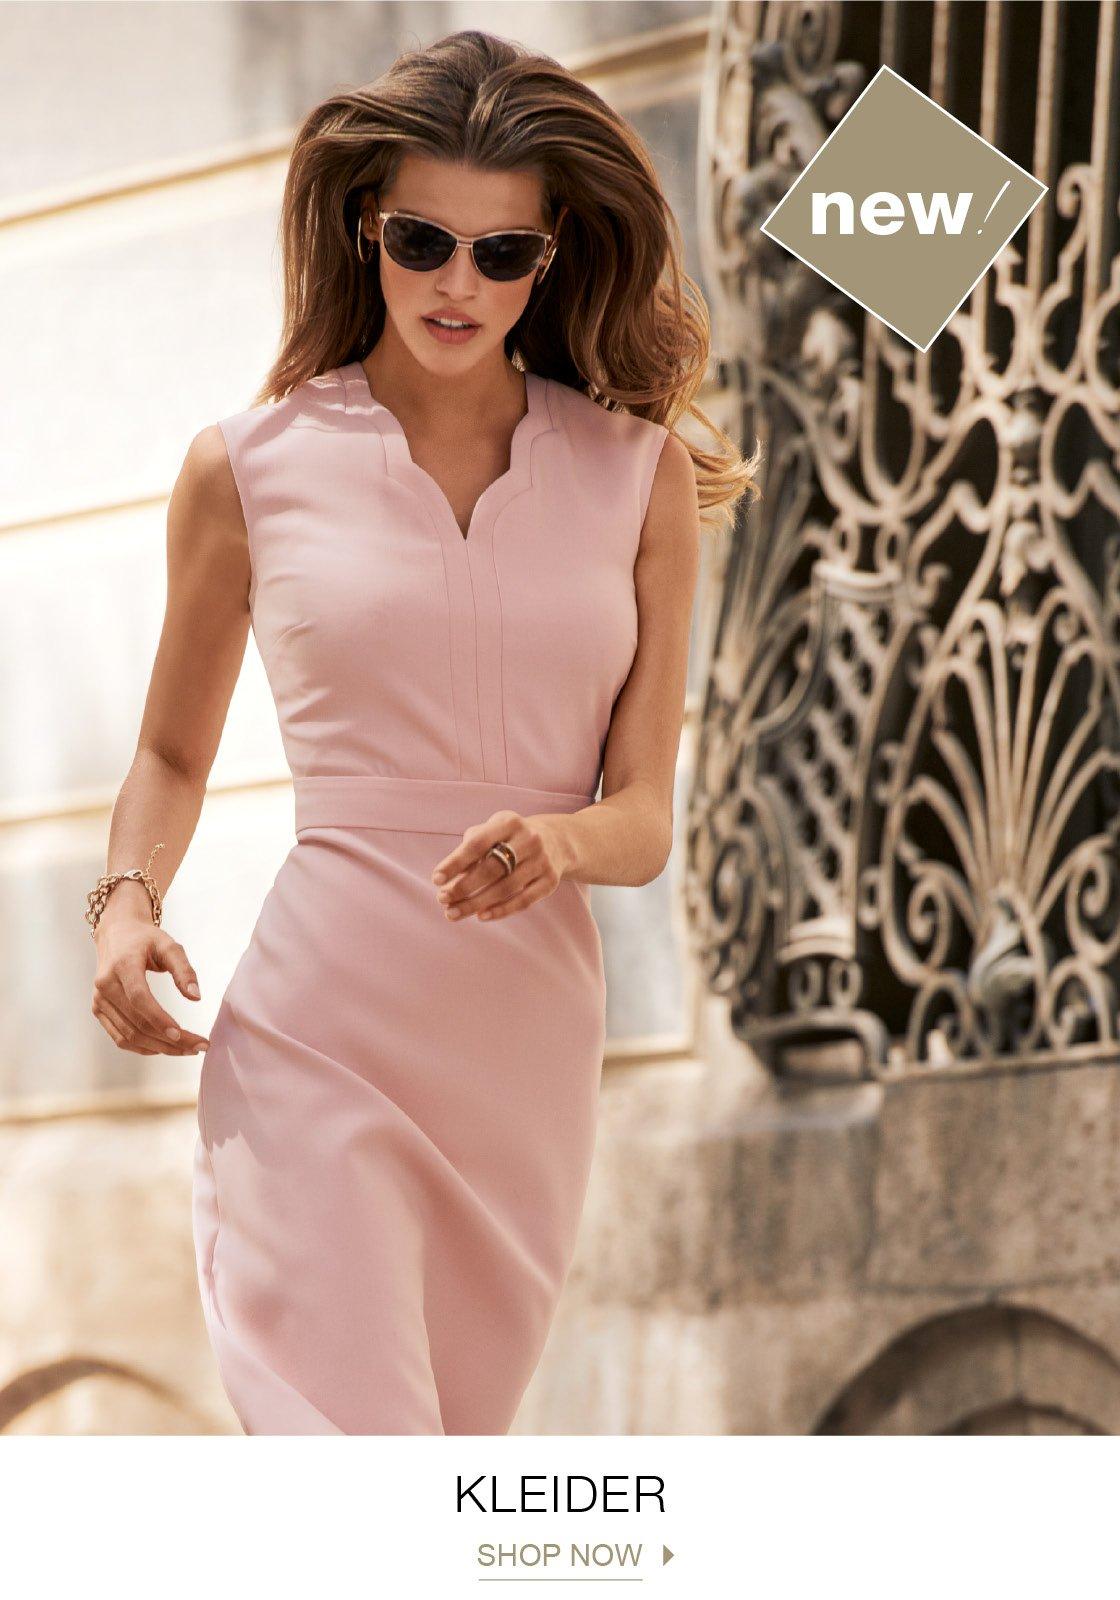 8f8be10ecf2fd1 Exklusive Damenmode online bestellen | Online Shop & Modeversand ...